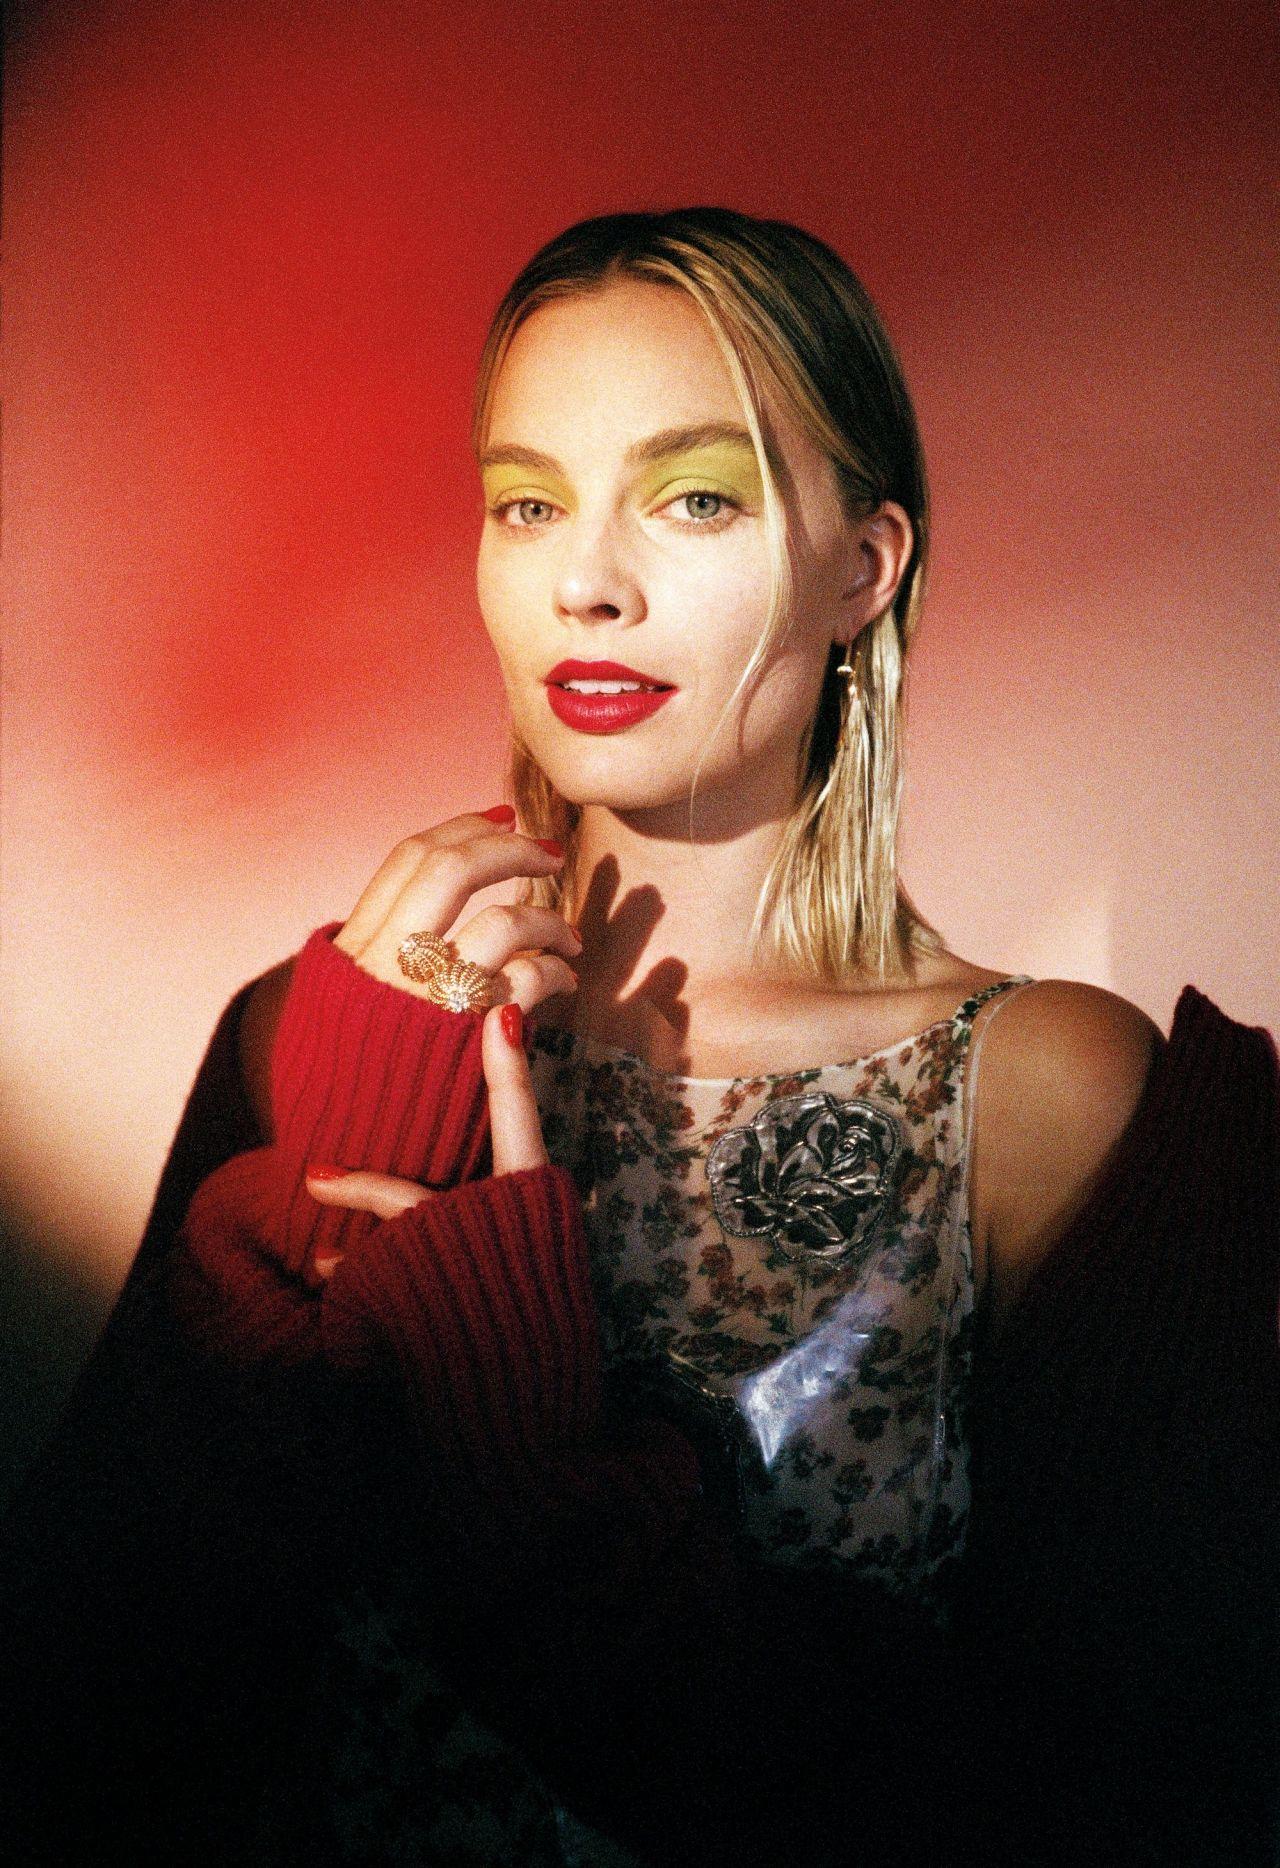 Forum on this topic: Zoi Gorman Tits, margot-robbie-deadline-portrait-studio-at-tiff/